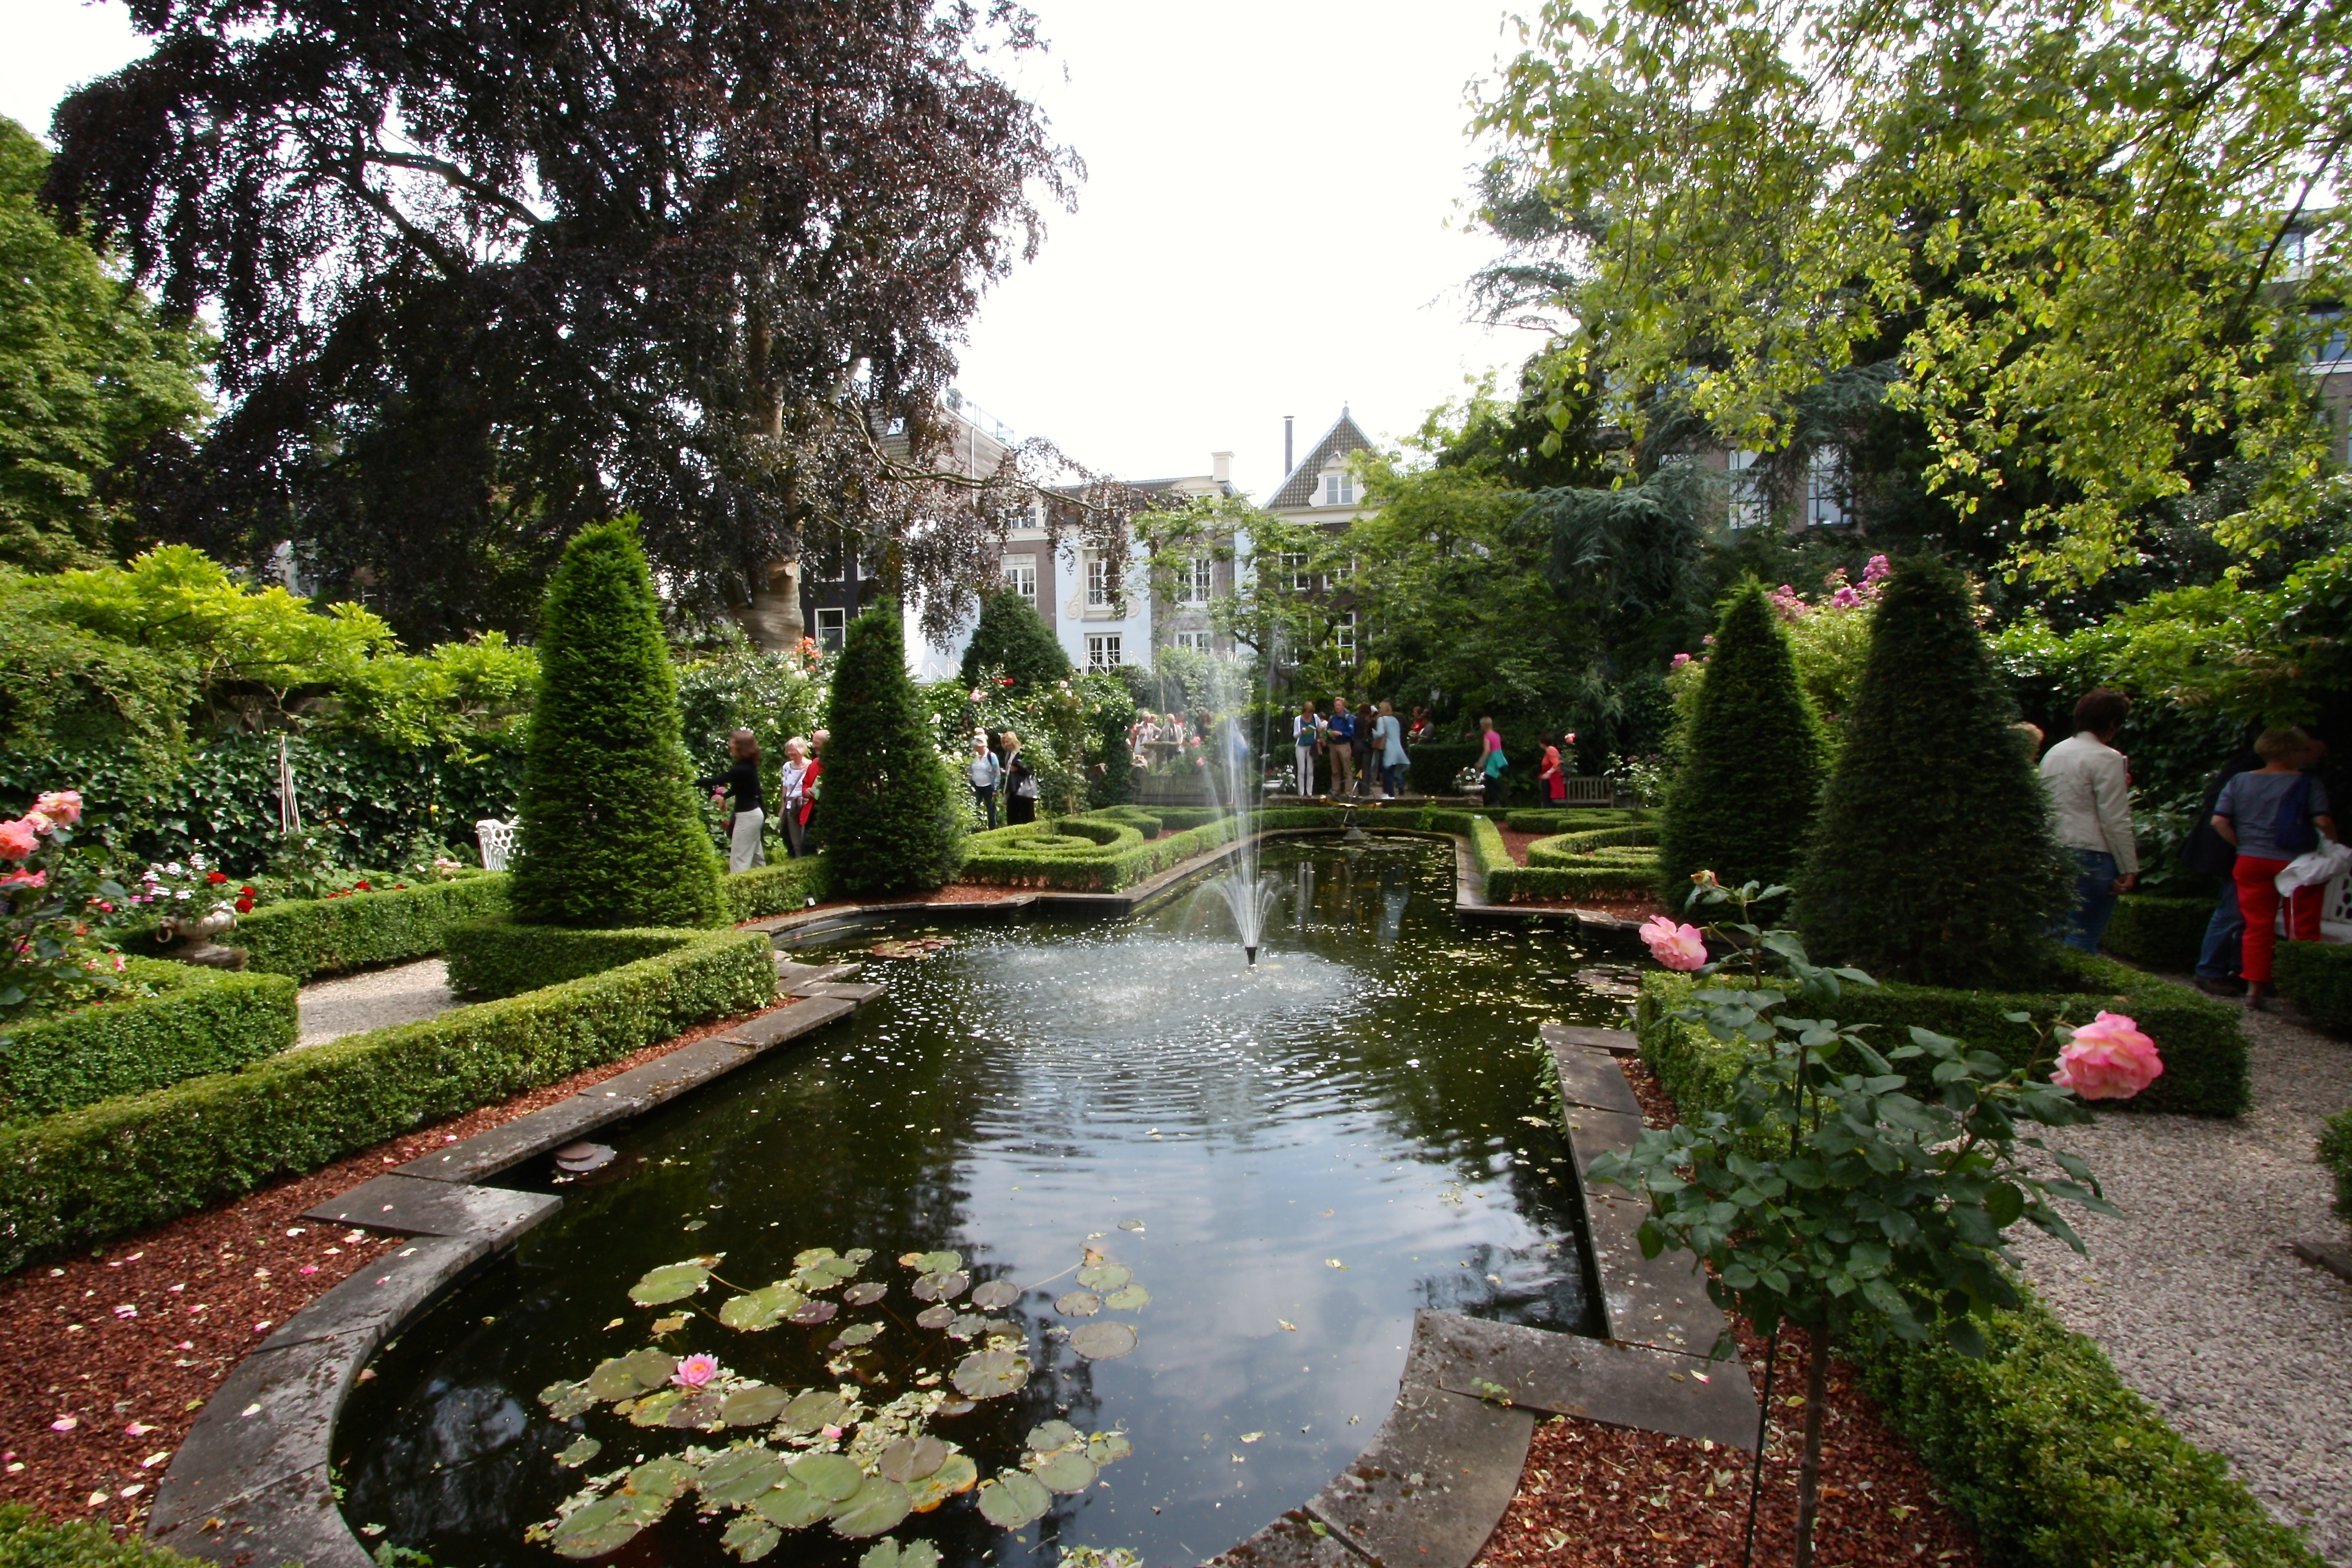 garden of the museum geelvinck amsterdam june 2014 - Amsterdam Garden